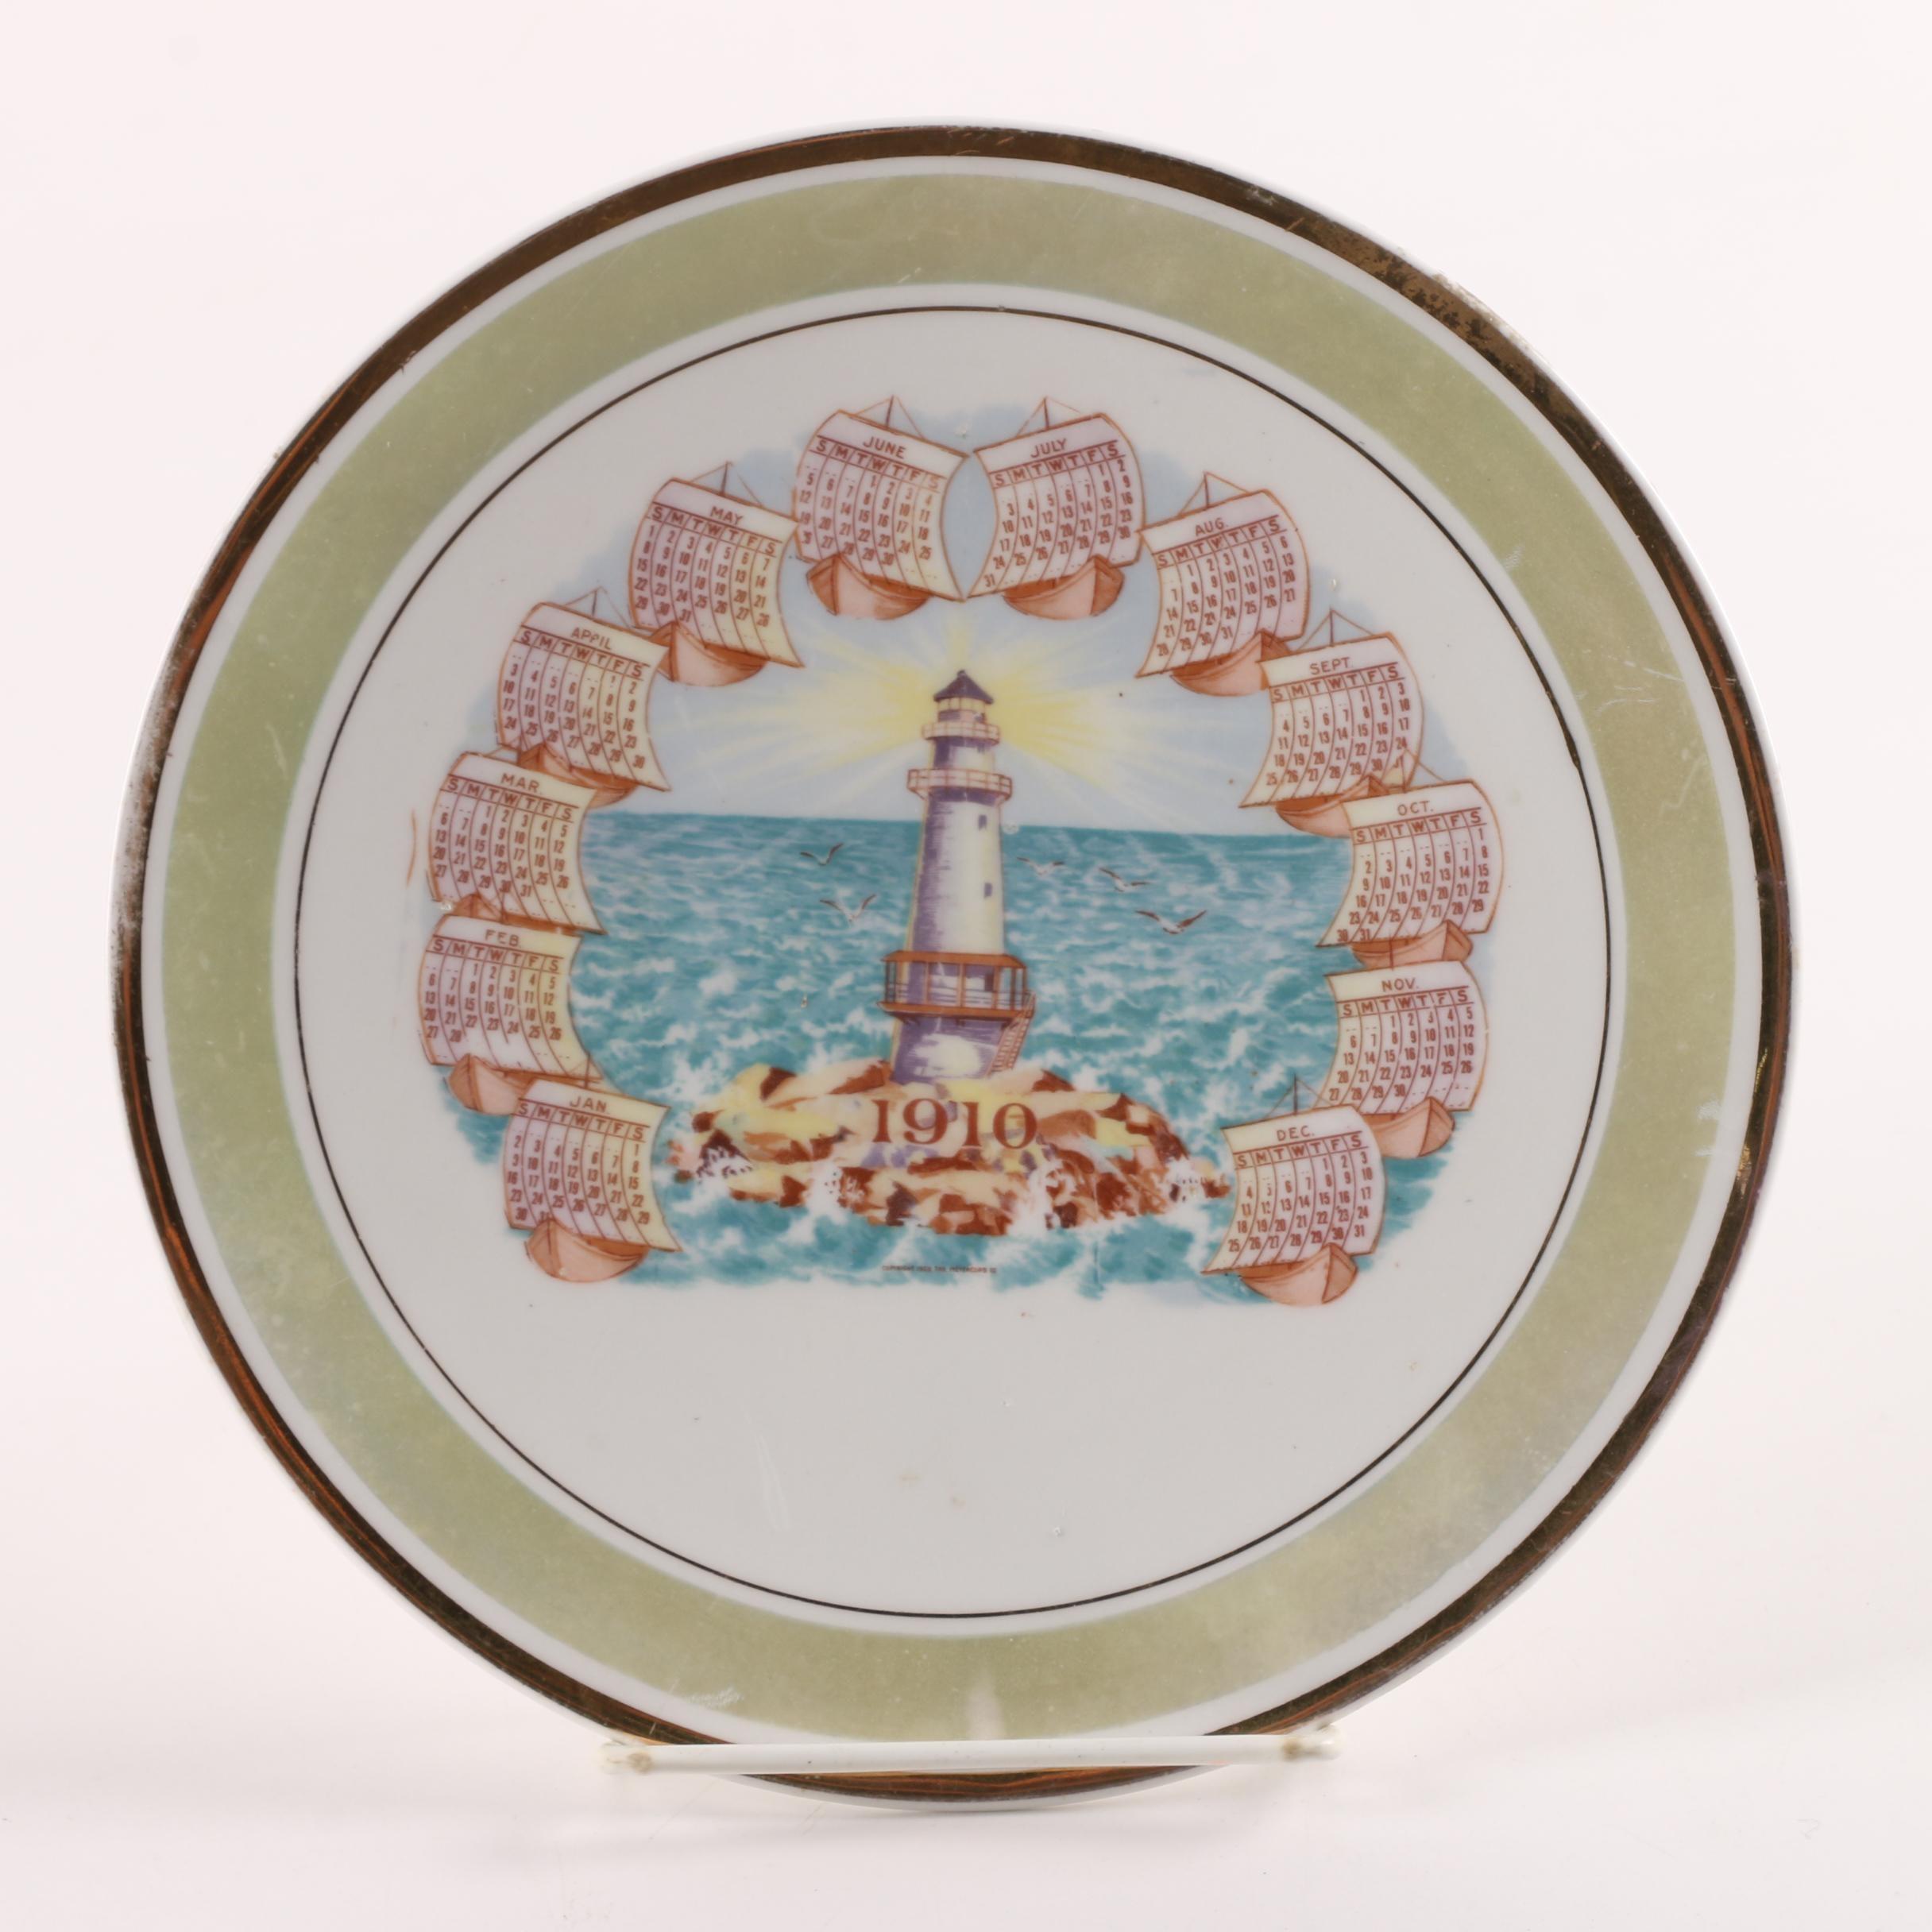 Antique Promotional Pope Gosser 1910 Calendar Plate with Lighthouse Design